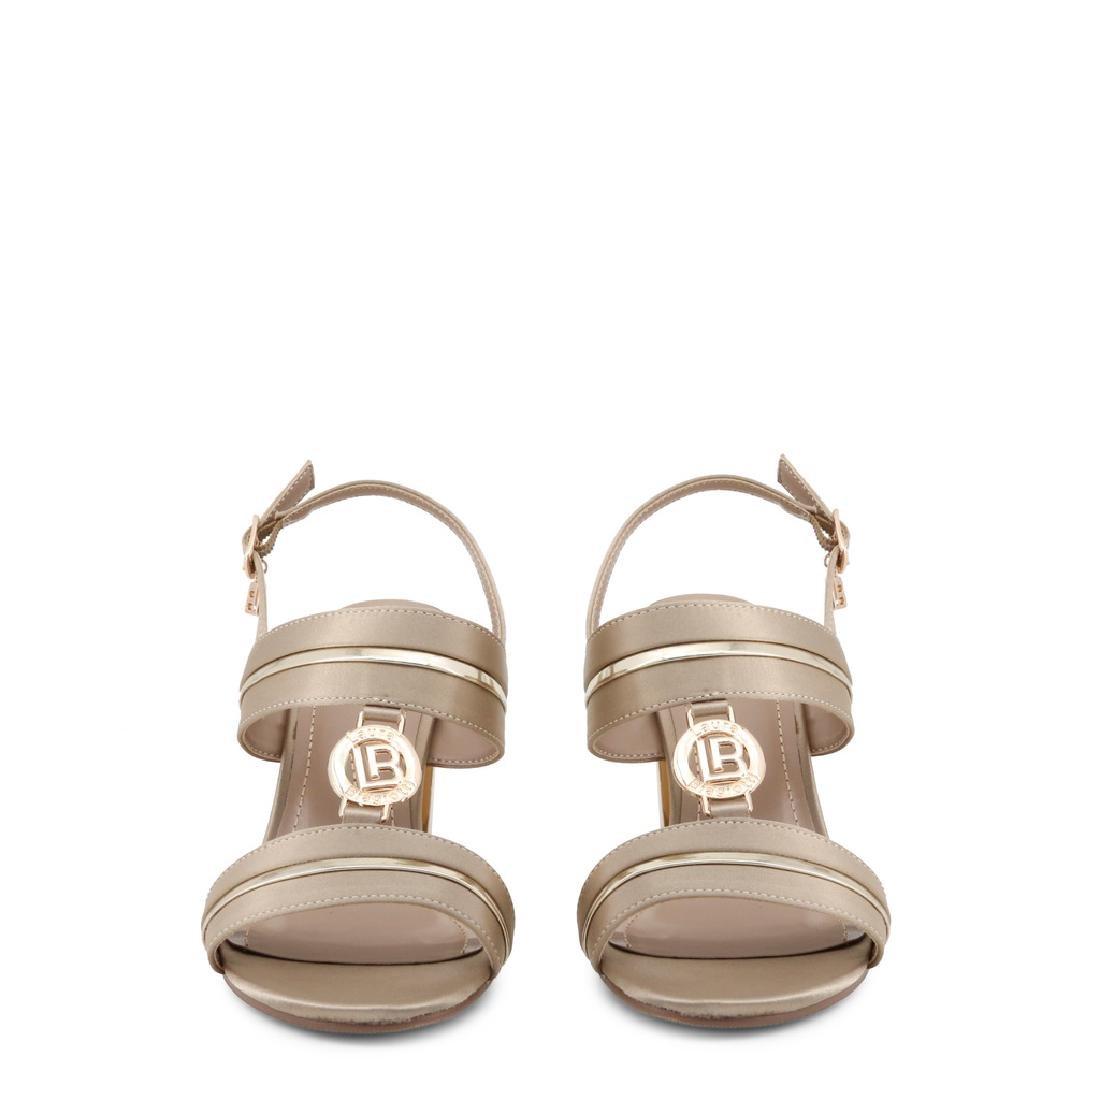 Laura Biagiotti Italian Designer High Heel Sandals EUR - 3